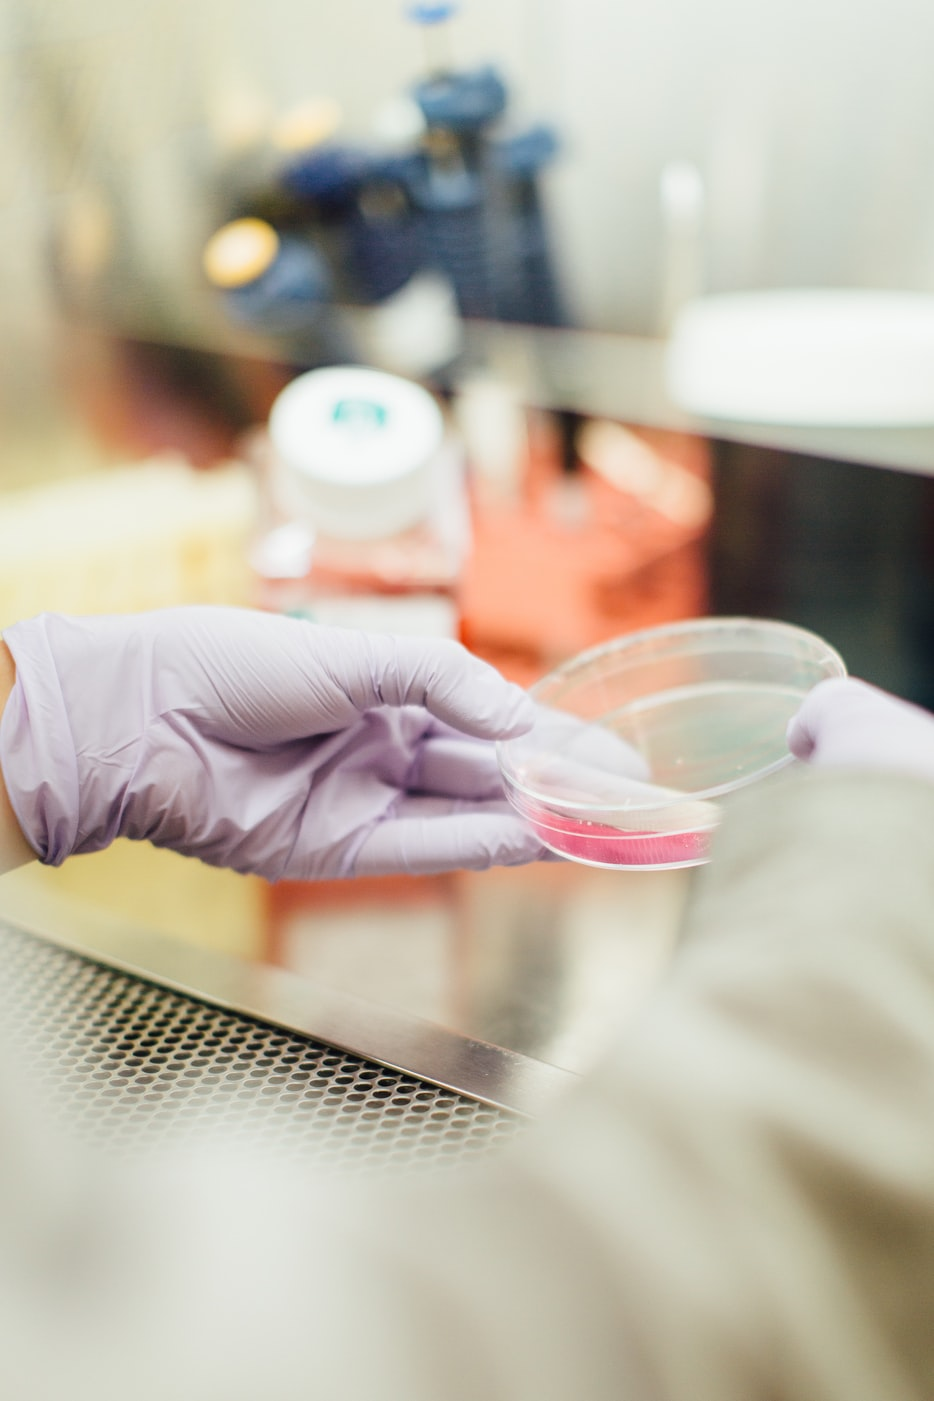 Scientist holding a petri dish.